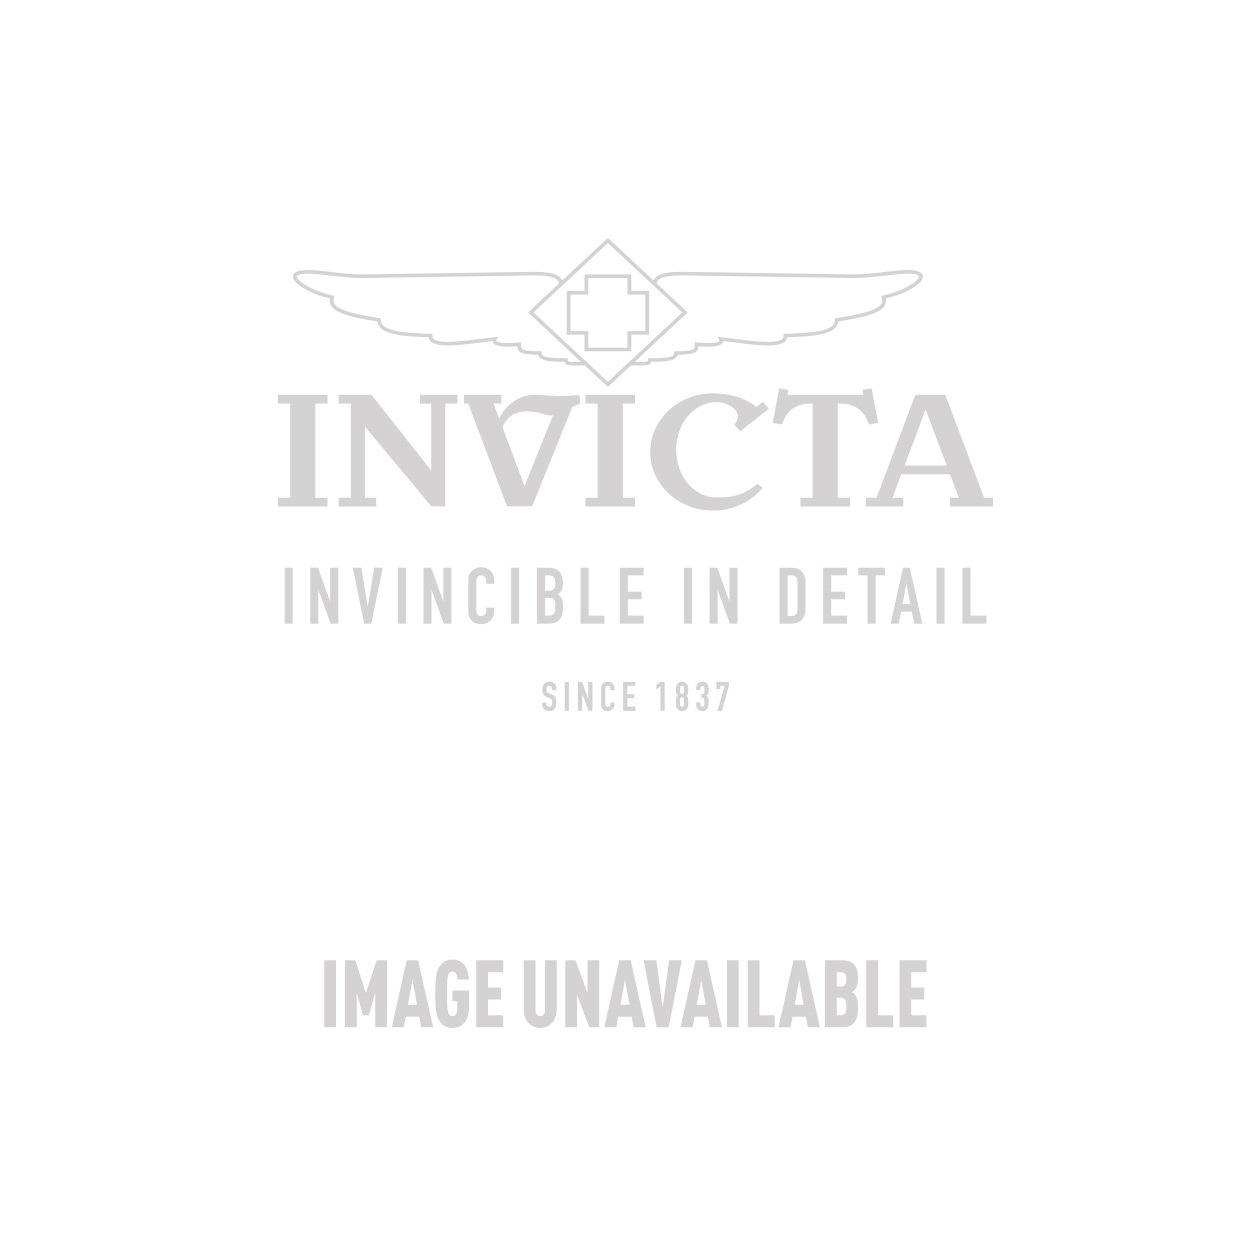 INVICTA Jewelry Incanto Necklaces 47 27.8 Silver 925 and Ceramic Black+Yellow Gold+Platinum - Model J0064